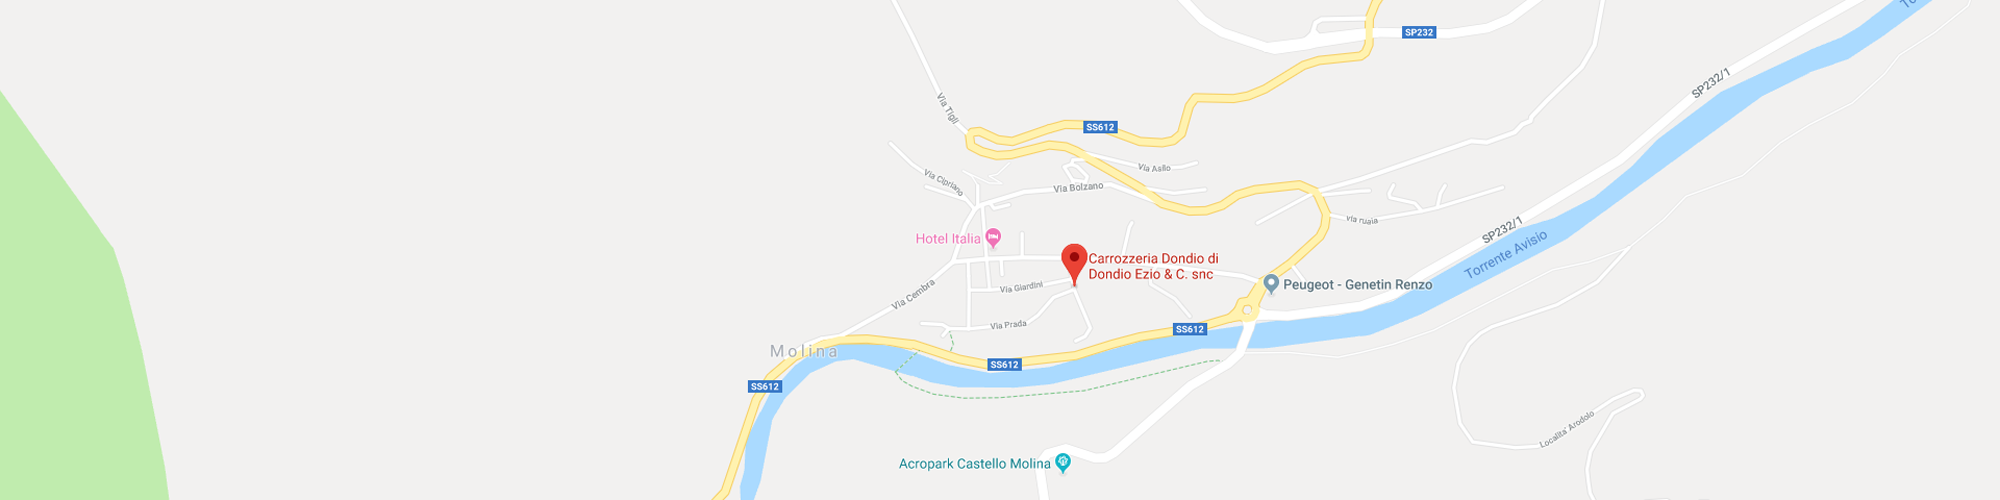 mappa_carrozzeria